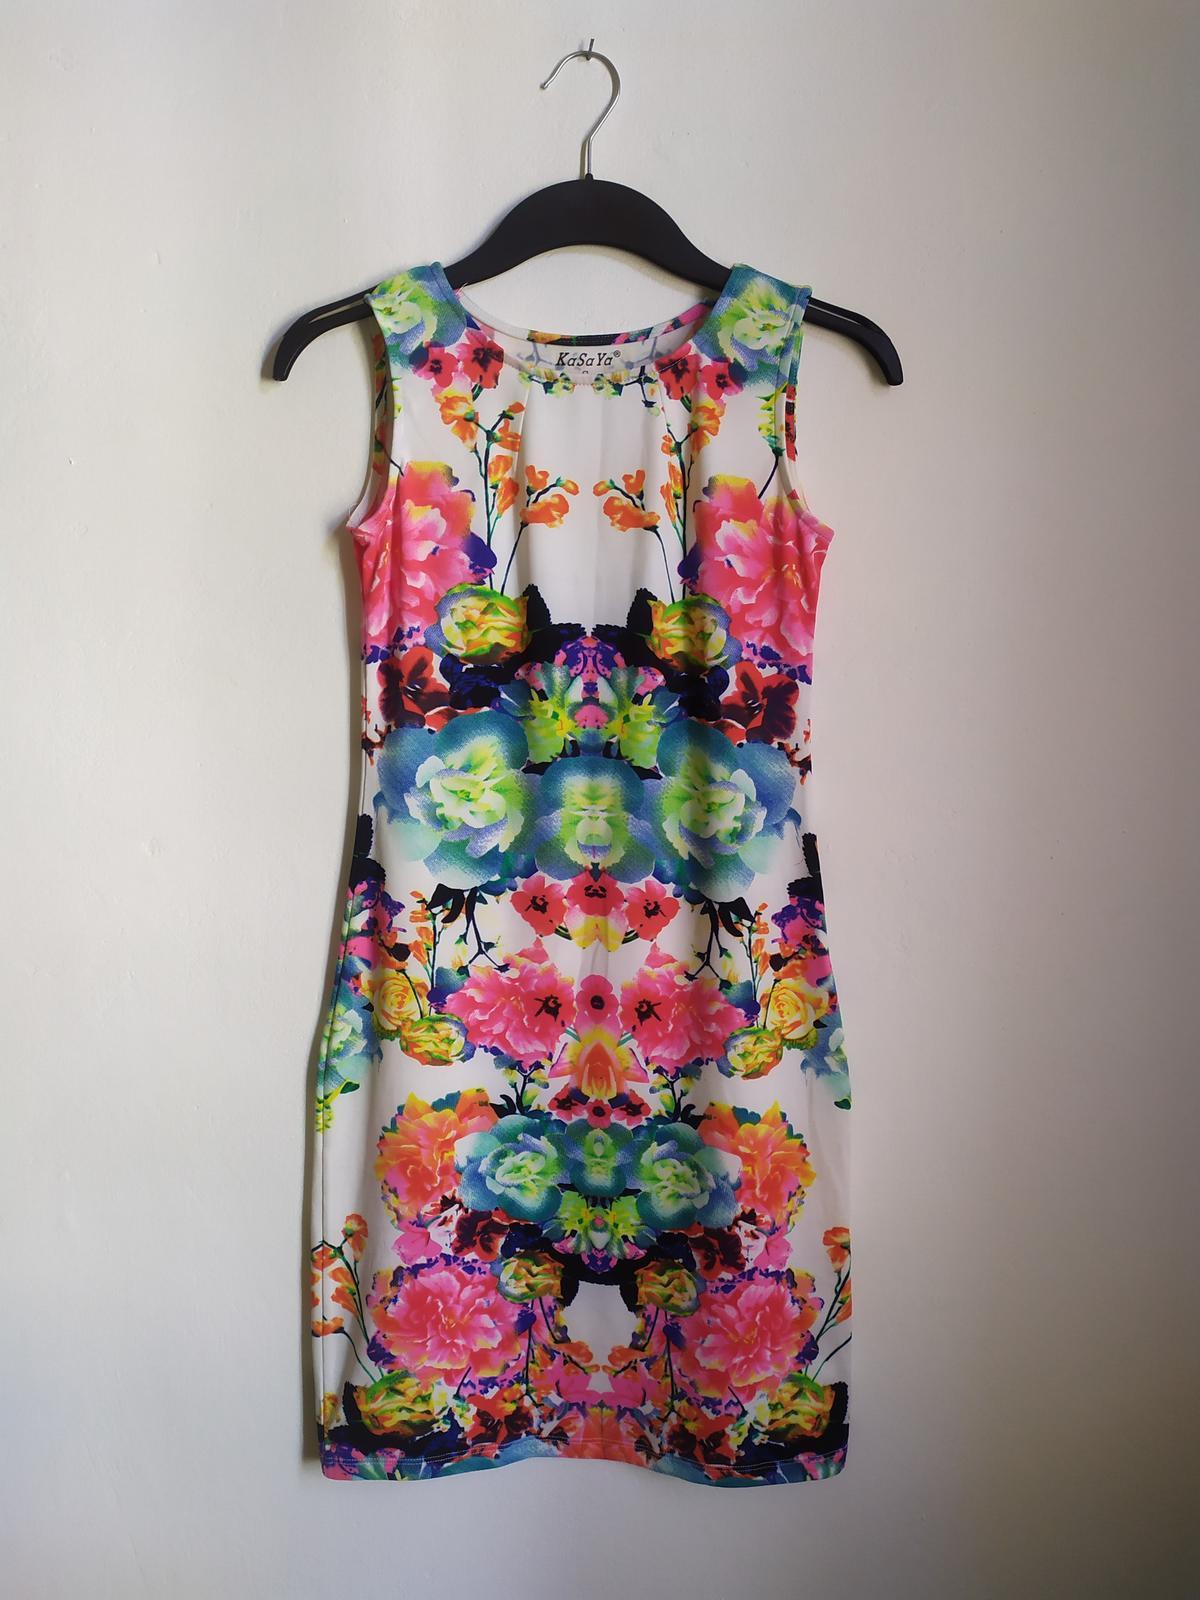 Barevné mini šaty na ramena - vel. S - Obrázek č. 2